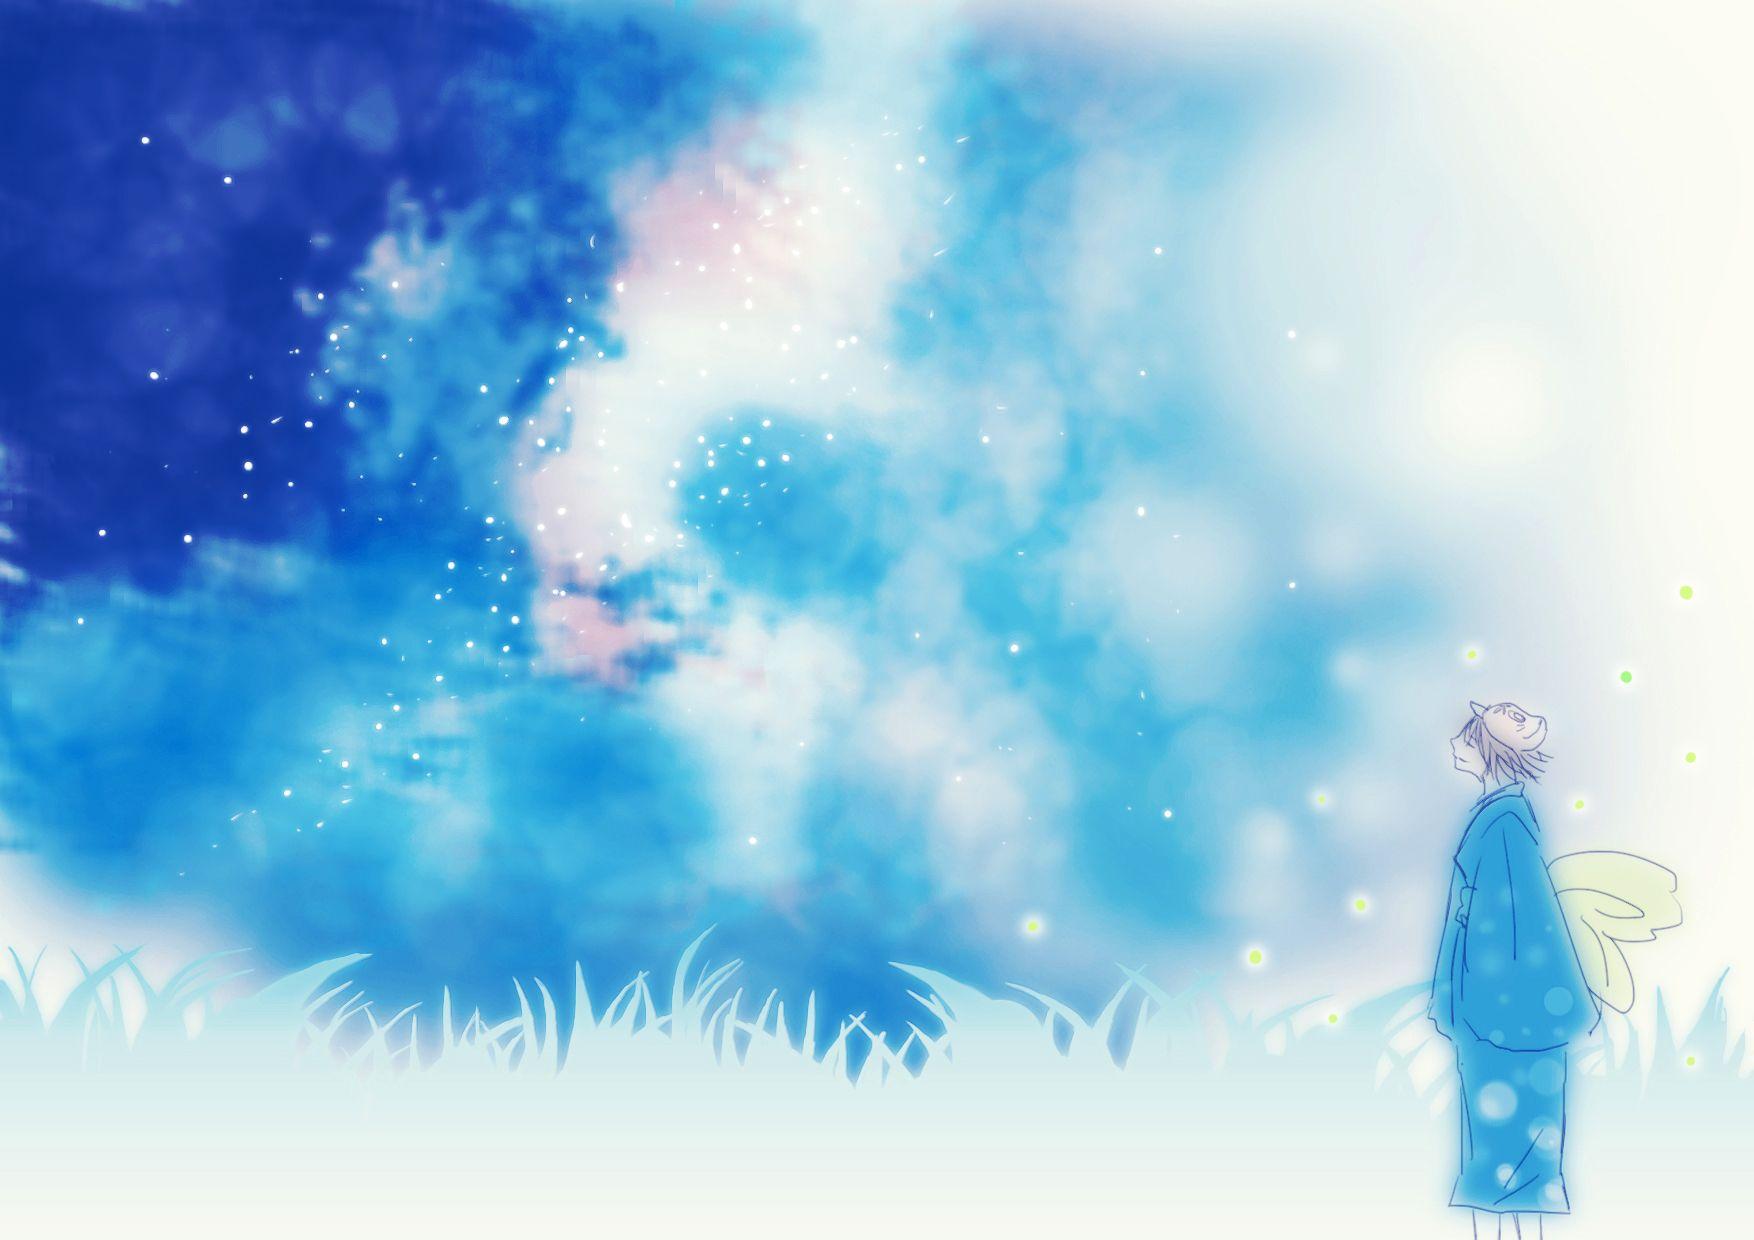 Gin (Hotarubi no Mori e)/494629 Zerochan Anime images